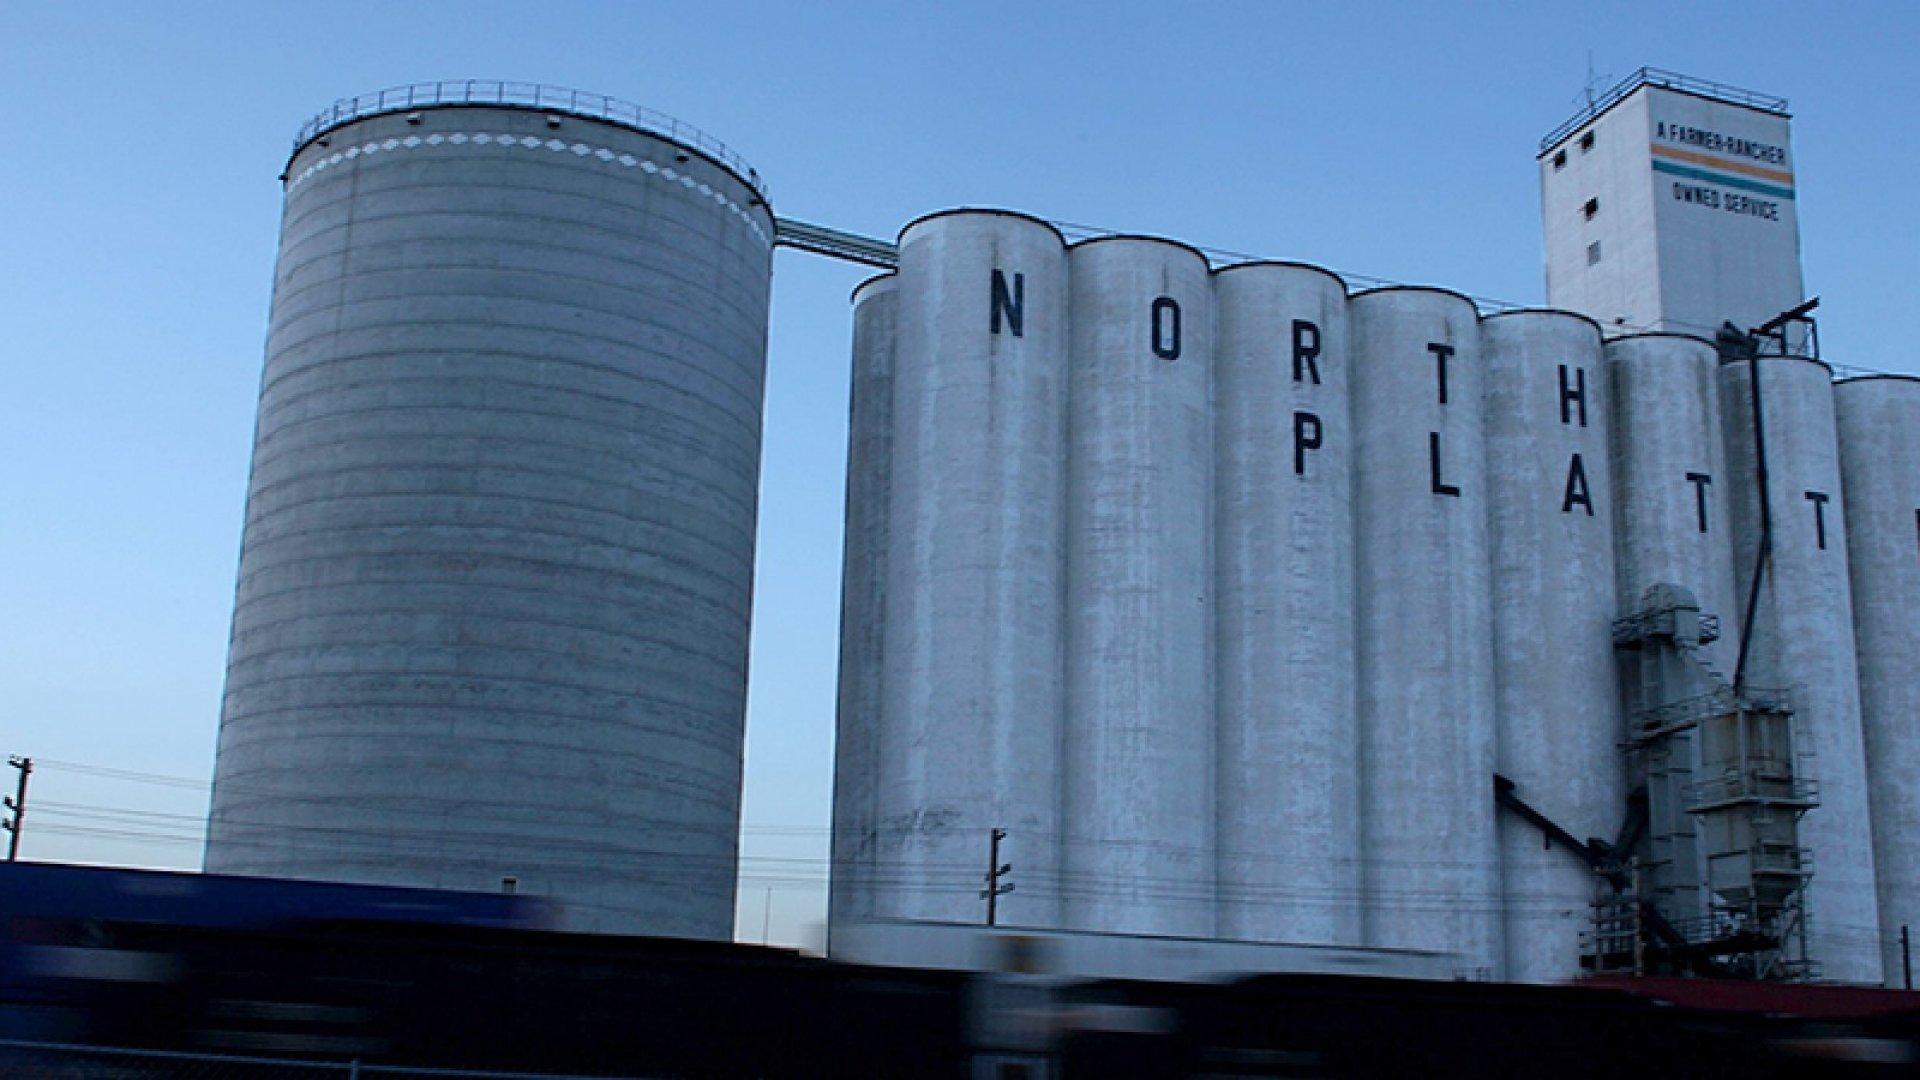 A grain elevator stands June 25, 2007 in North Platte, Nebraska.